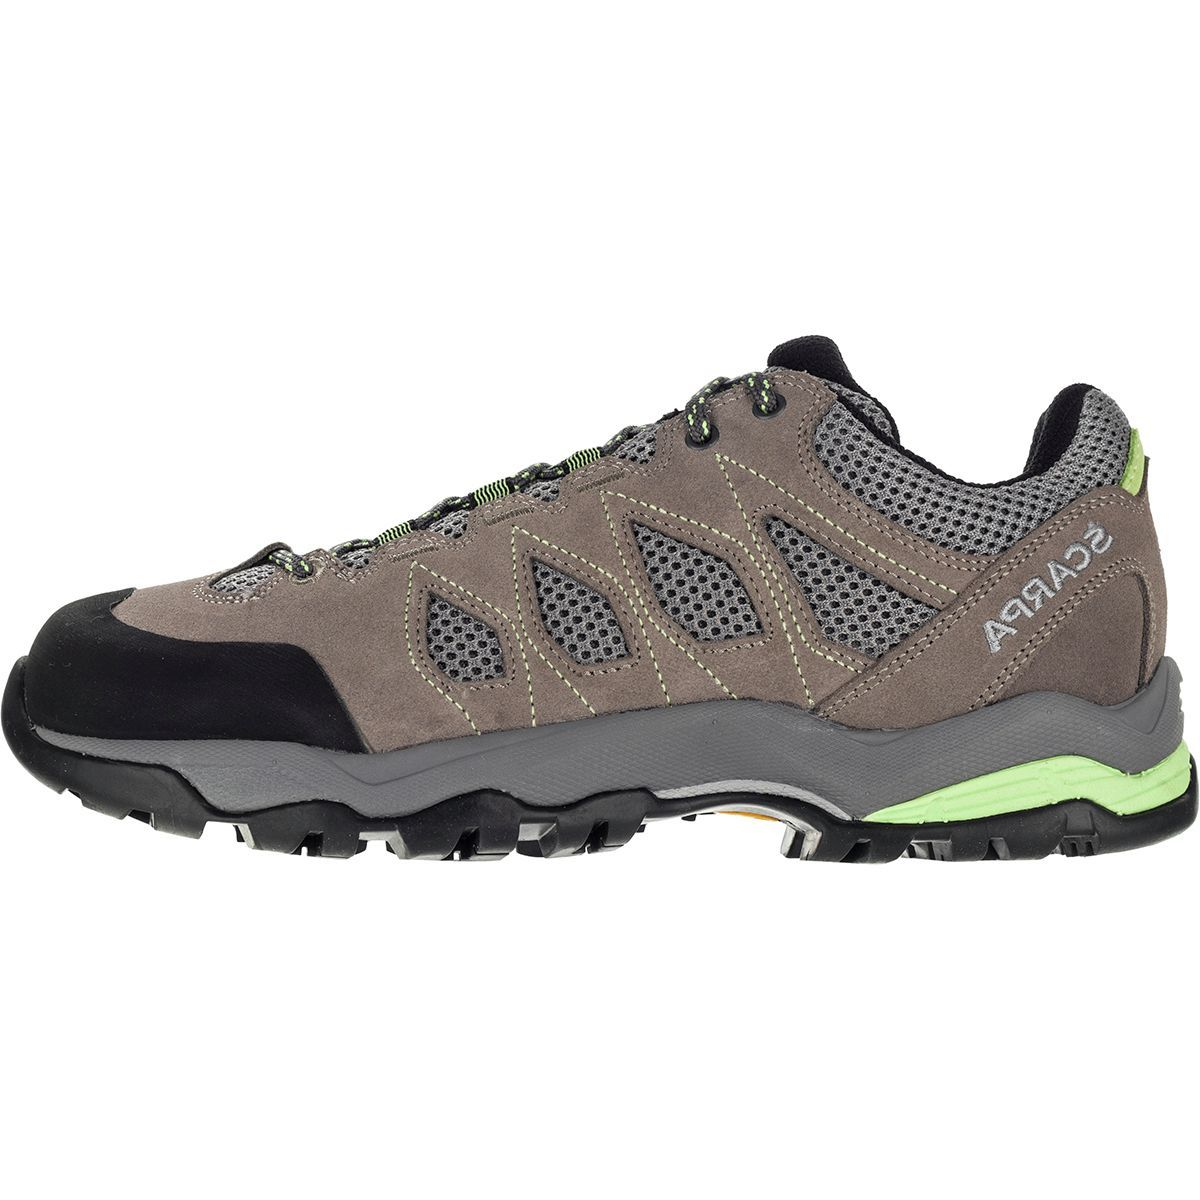 Scarpa Moraine Air Hiking Shoe - Women's